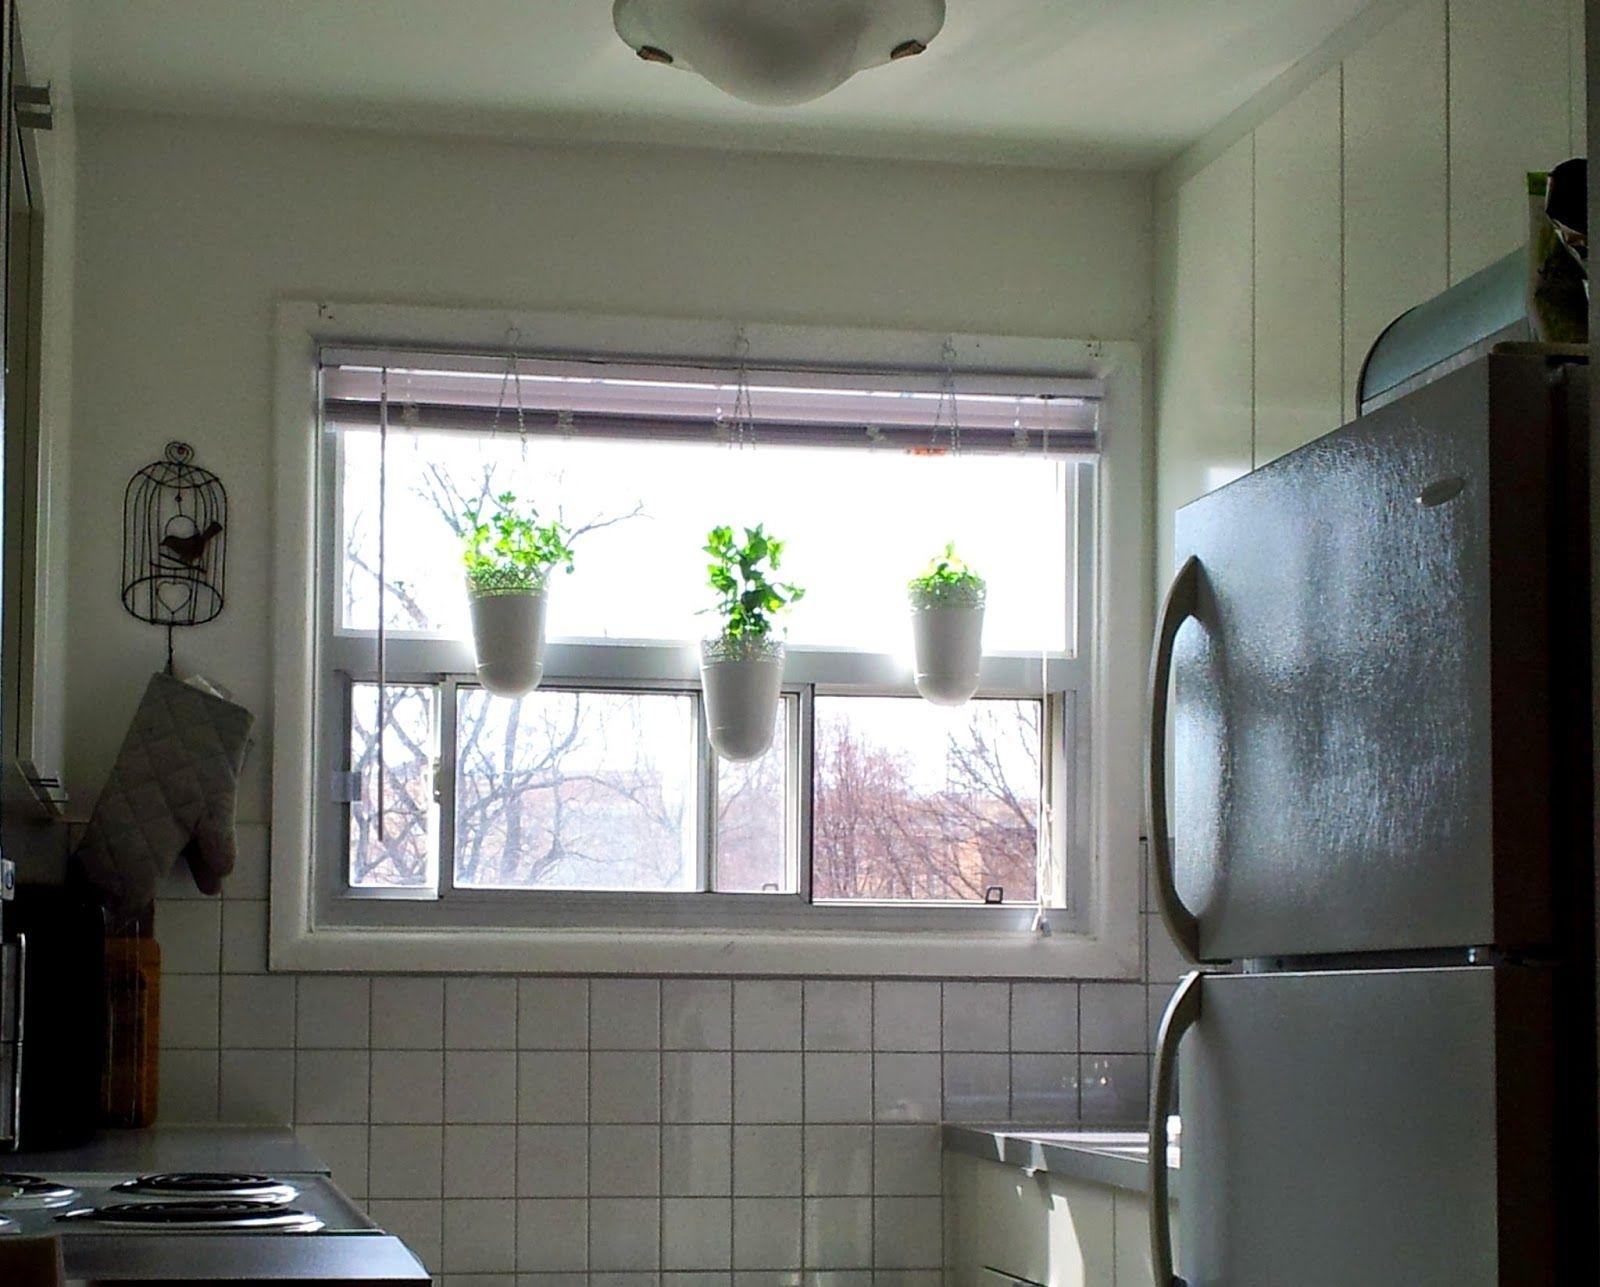 Garden outside kitchen window navigatorspbfo